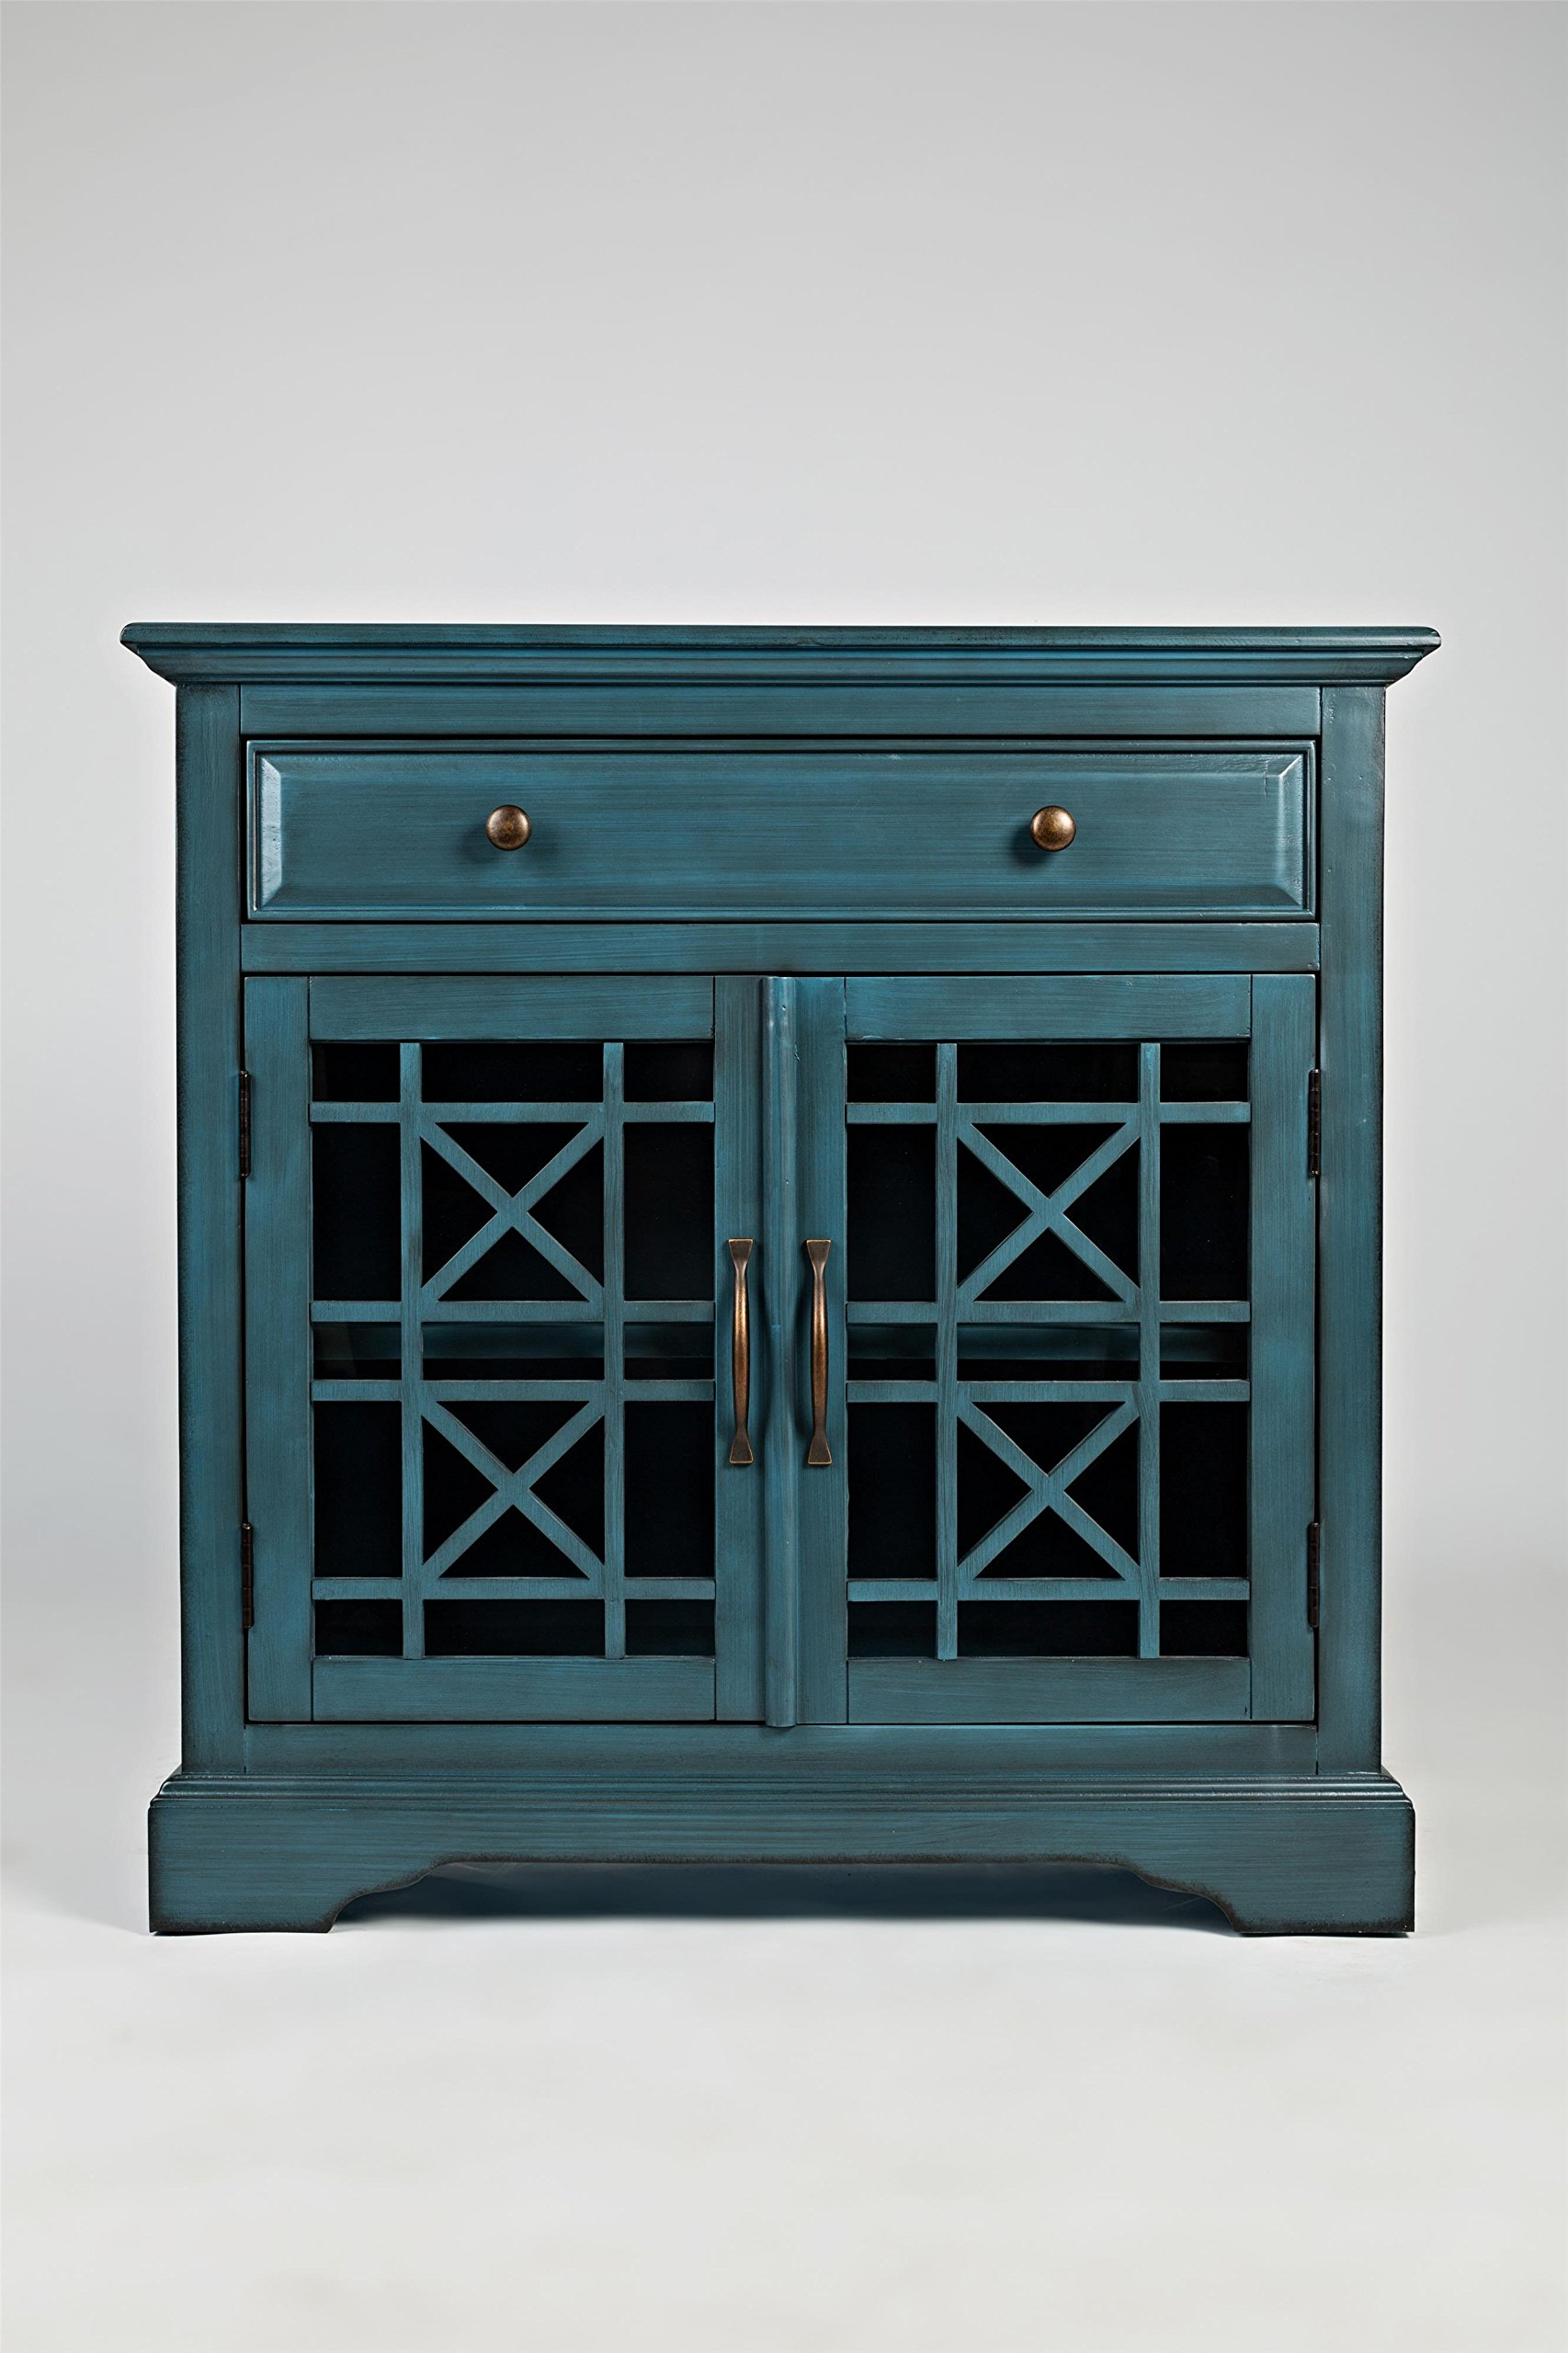 Jofran: 175-32, Craftsman, Accent Chest, 32''W X 15''D X 32''H, Antique Blue Finish, (Set of 1) by Jofran